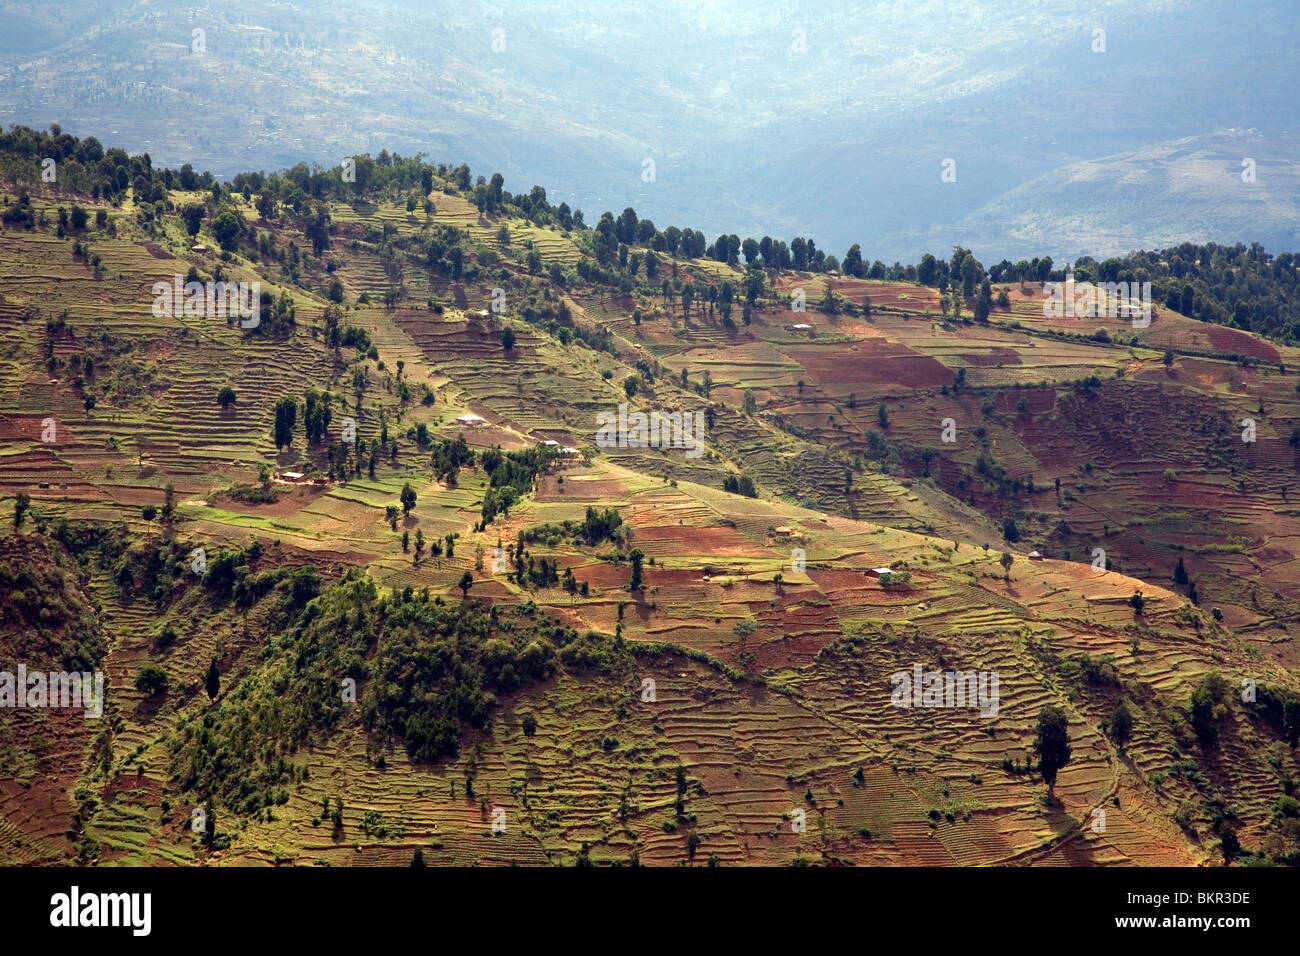 Ethiopia, Dire Dawa. The mountain ranges around Dire Dawa. - Stock Image